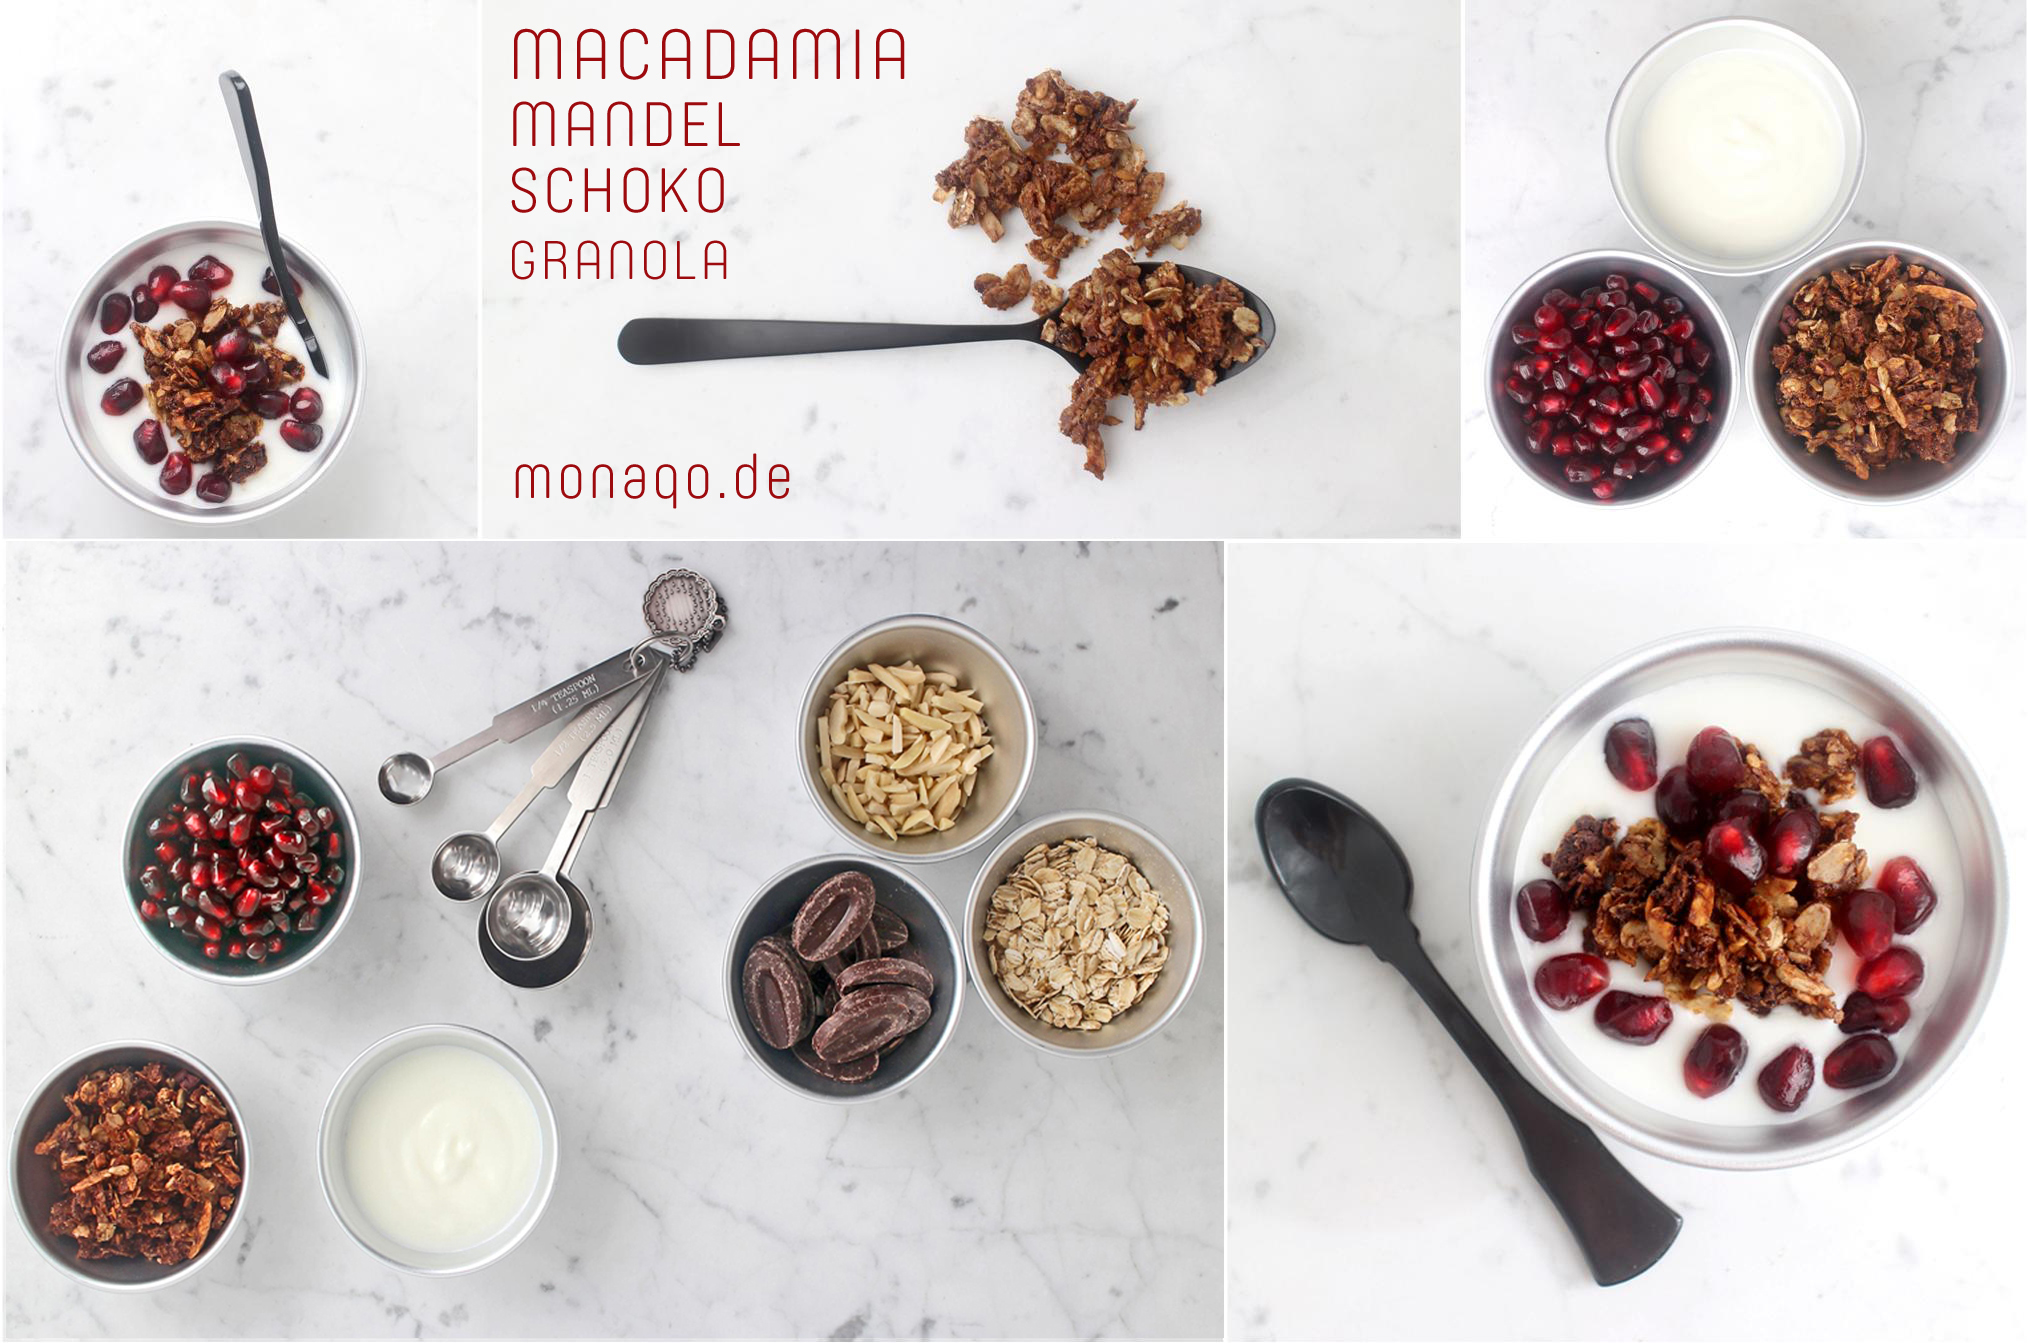 Knuspermüsli mit Macadamias: Schoko-Macadamia-Mandel-Granola